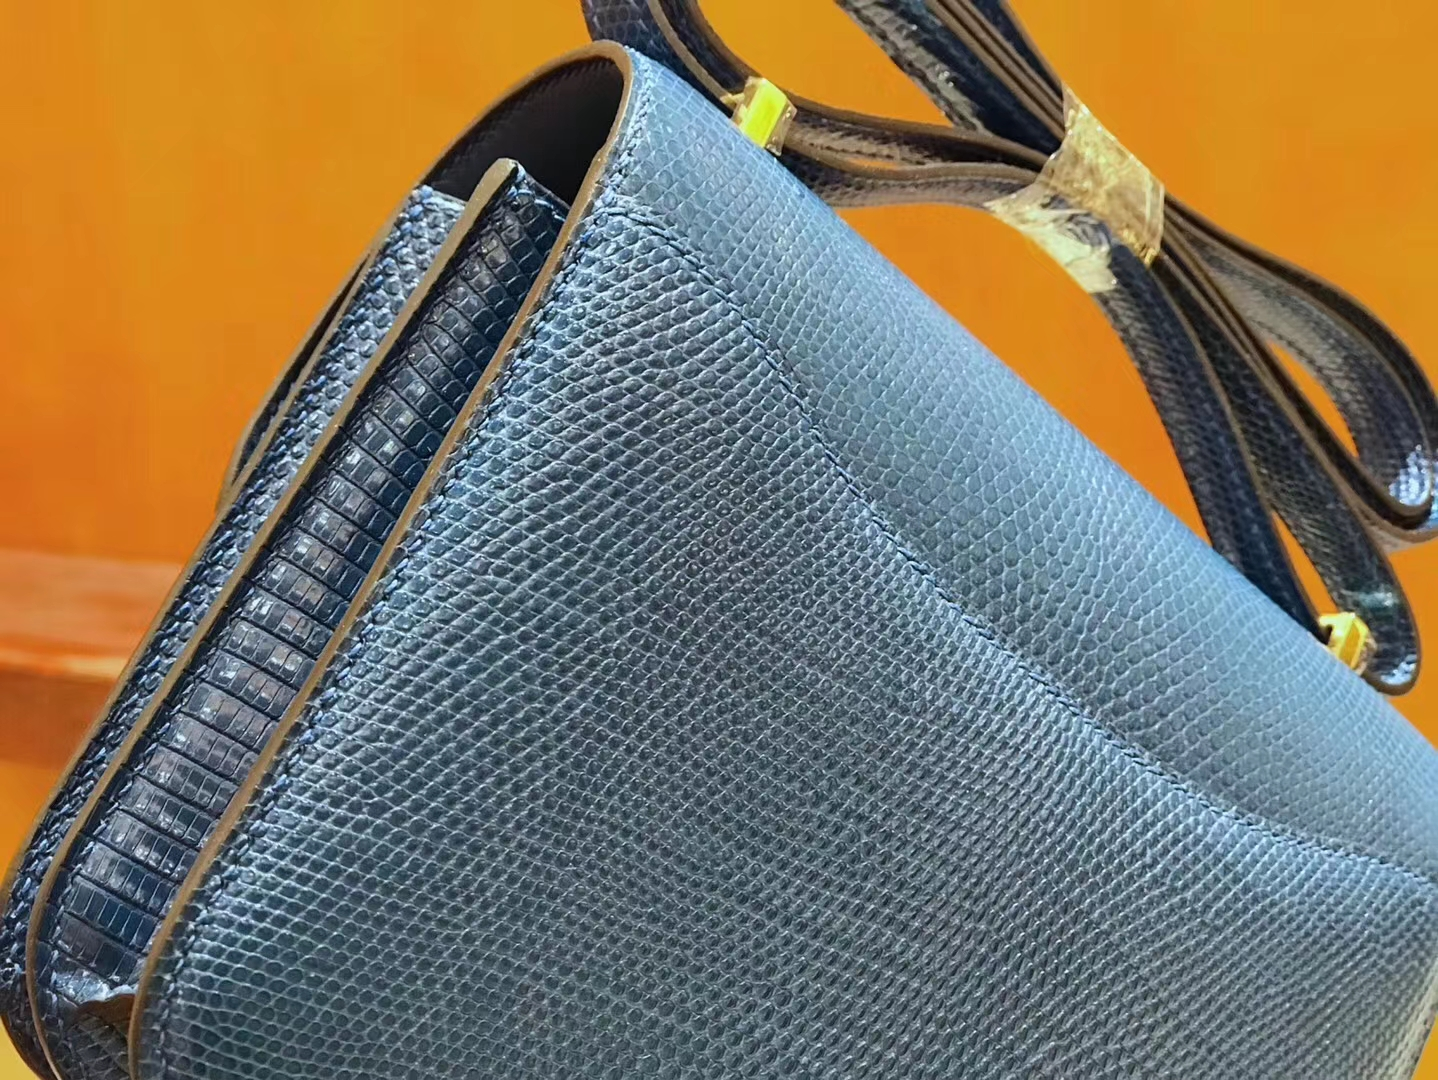 Hermès(爱马仕)Constance 18cm 坦桑尼亚蓝 南非野生蜥蜴皮 金扣 原版蜜蜡线 顶级手缝